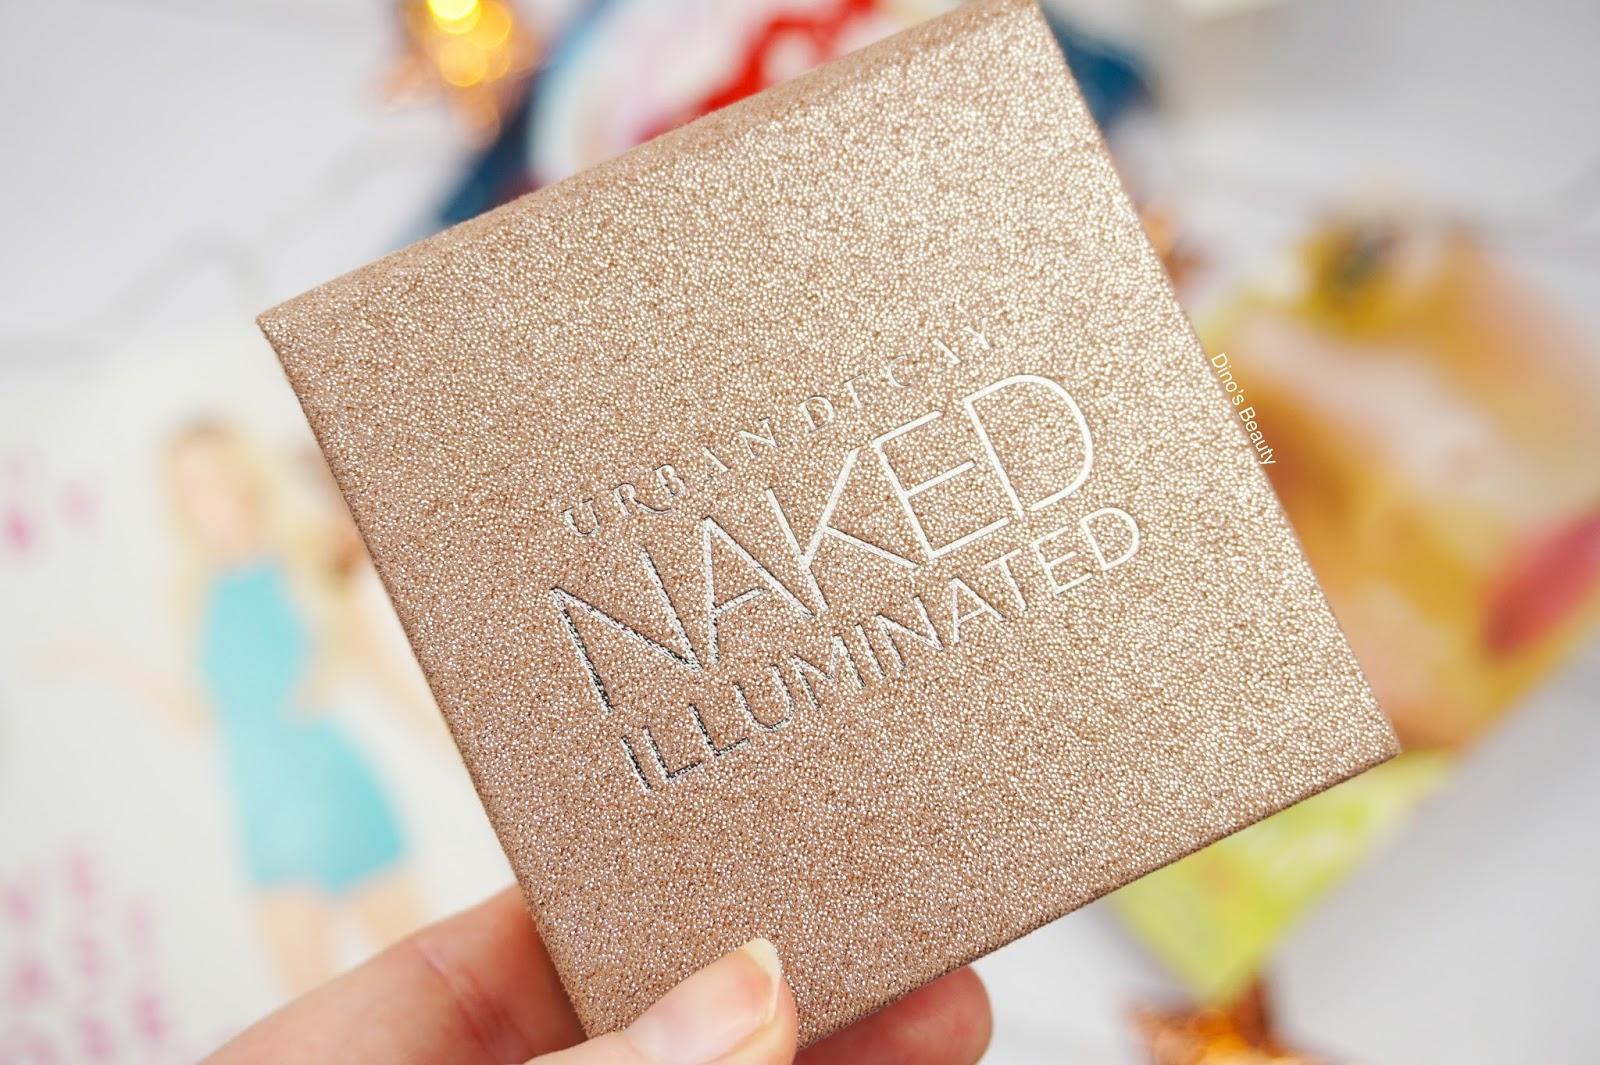 Beauty, Lifestyle, Beauty Bloggers, Bloggers, Lifestyle Bloggers, 2016, 2016 Favourites, Urban Decay, Illuminated, Illuminator, Baked, Highlighter, Luminous, UD, Urban Decay Naked, Naked, Naked Highlighter